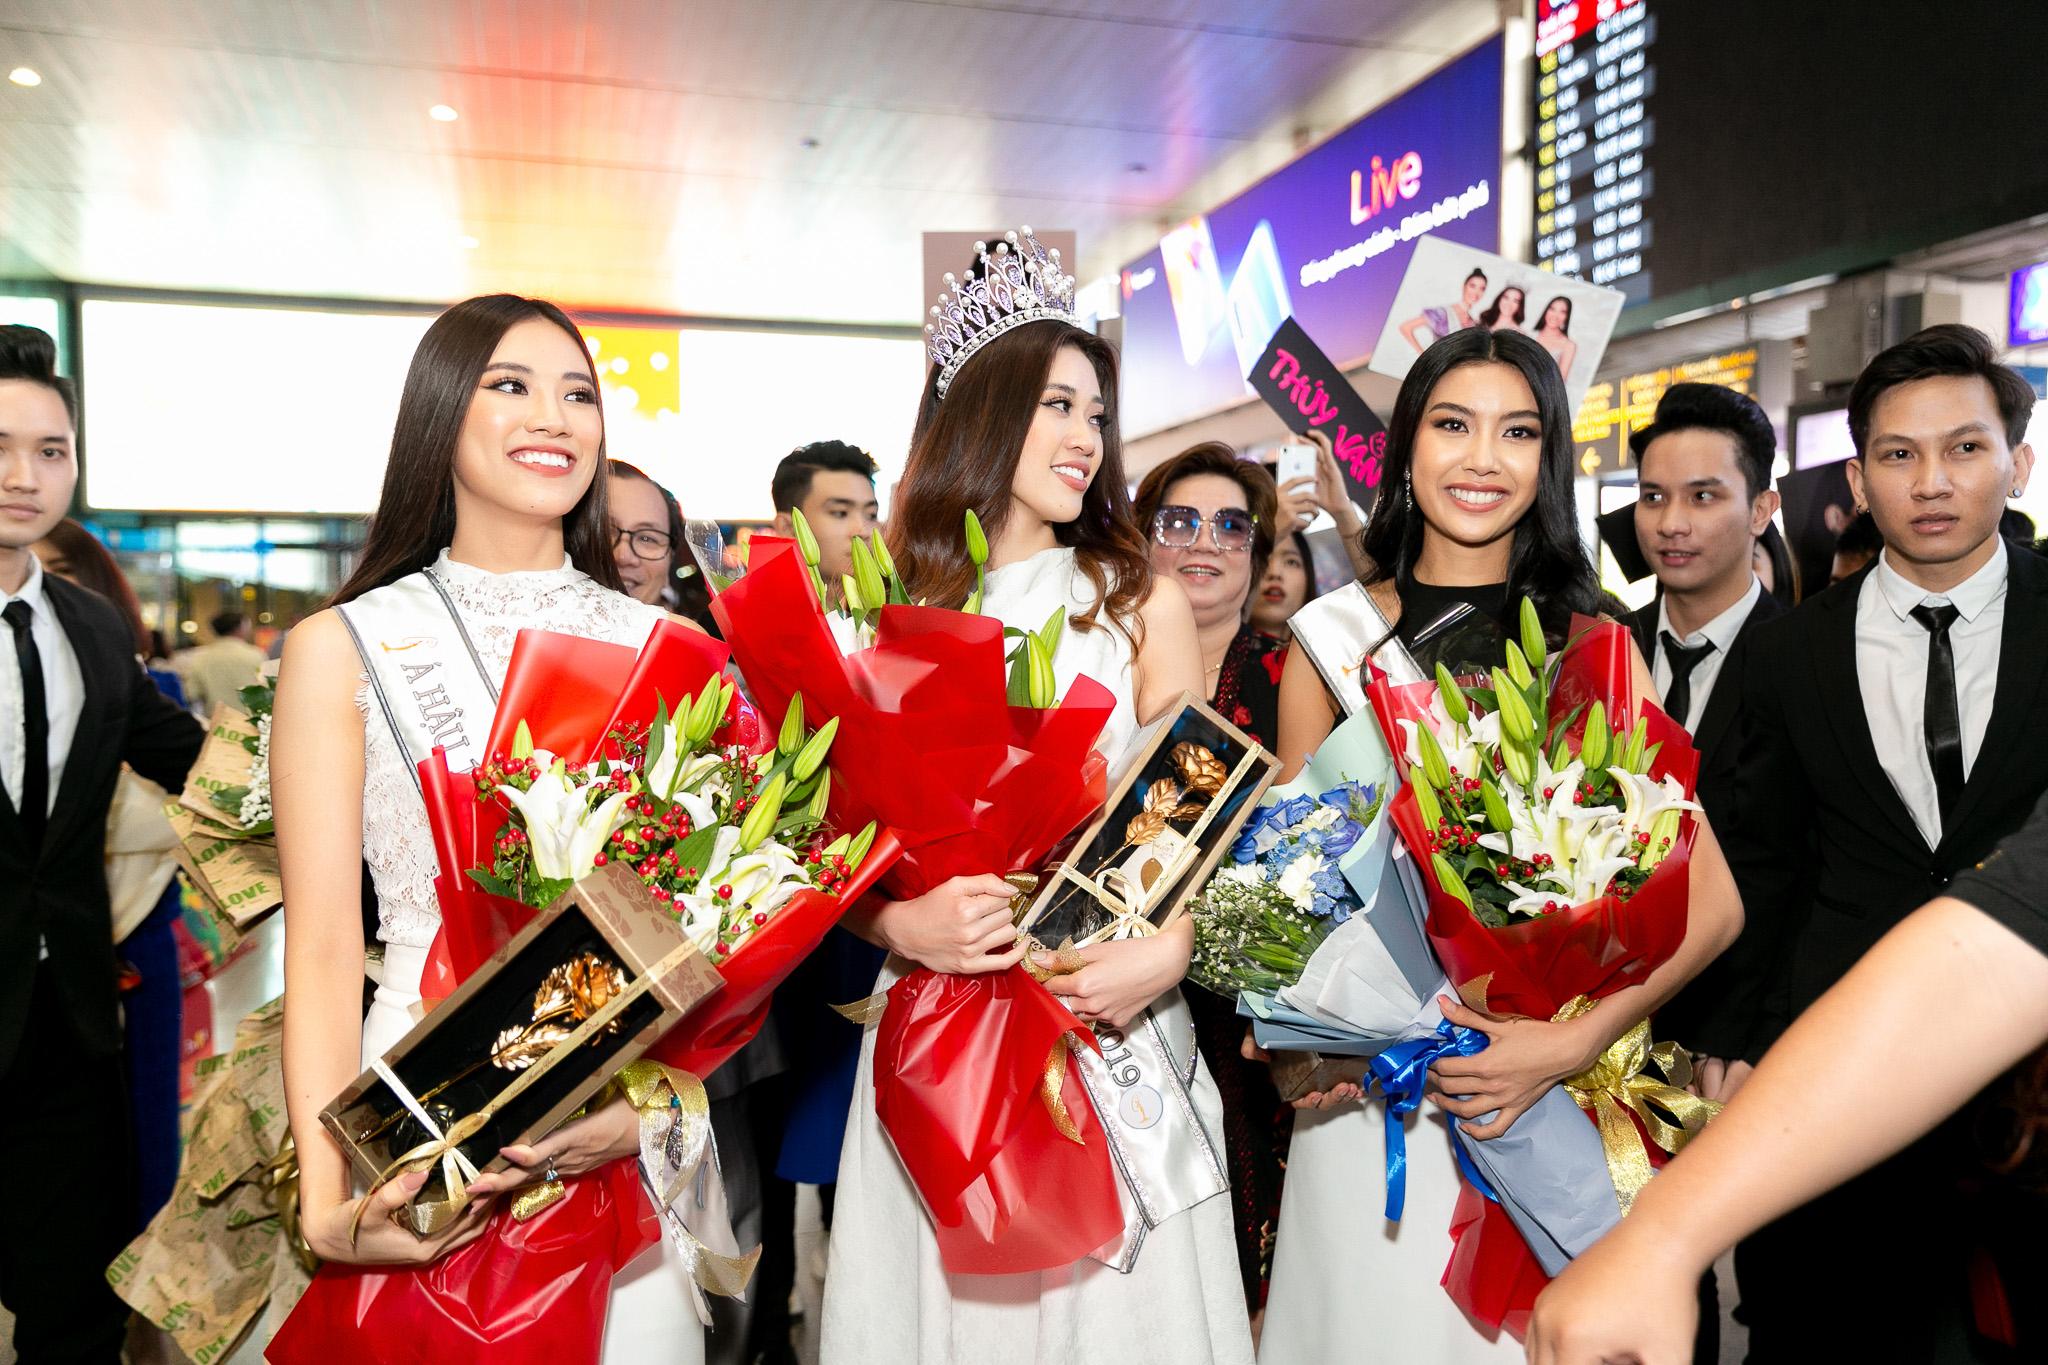 Top 3 Hoa hau Hoan vu Viet Nam 2019 tro ve TPHCM (7)